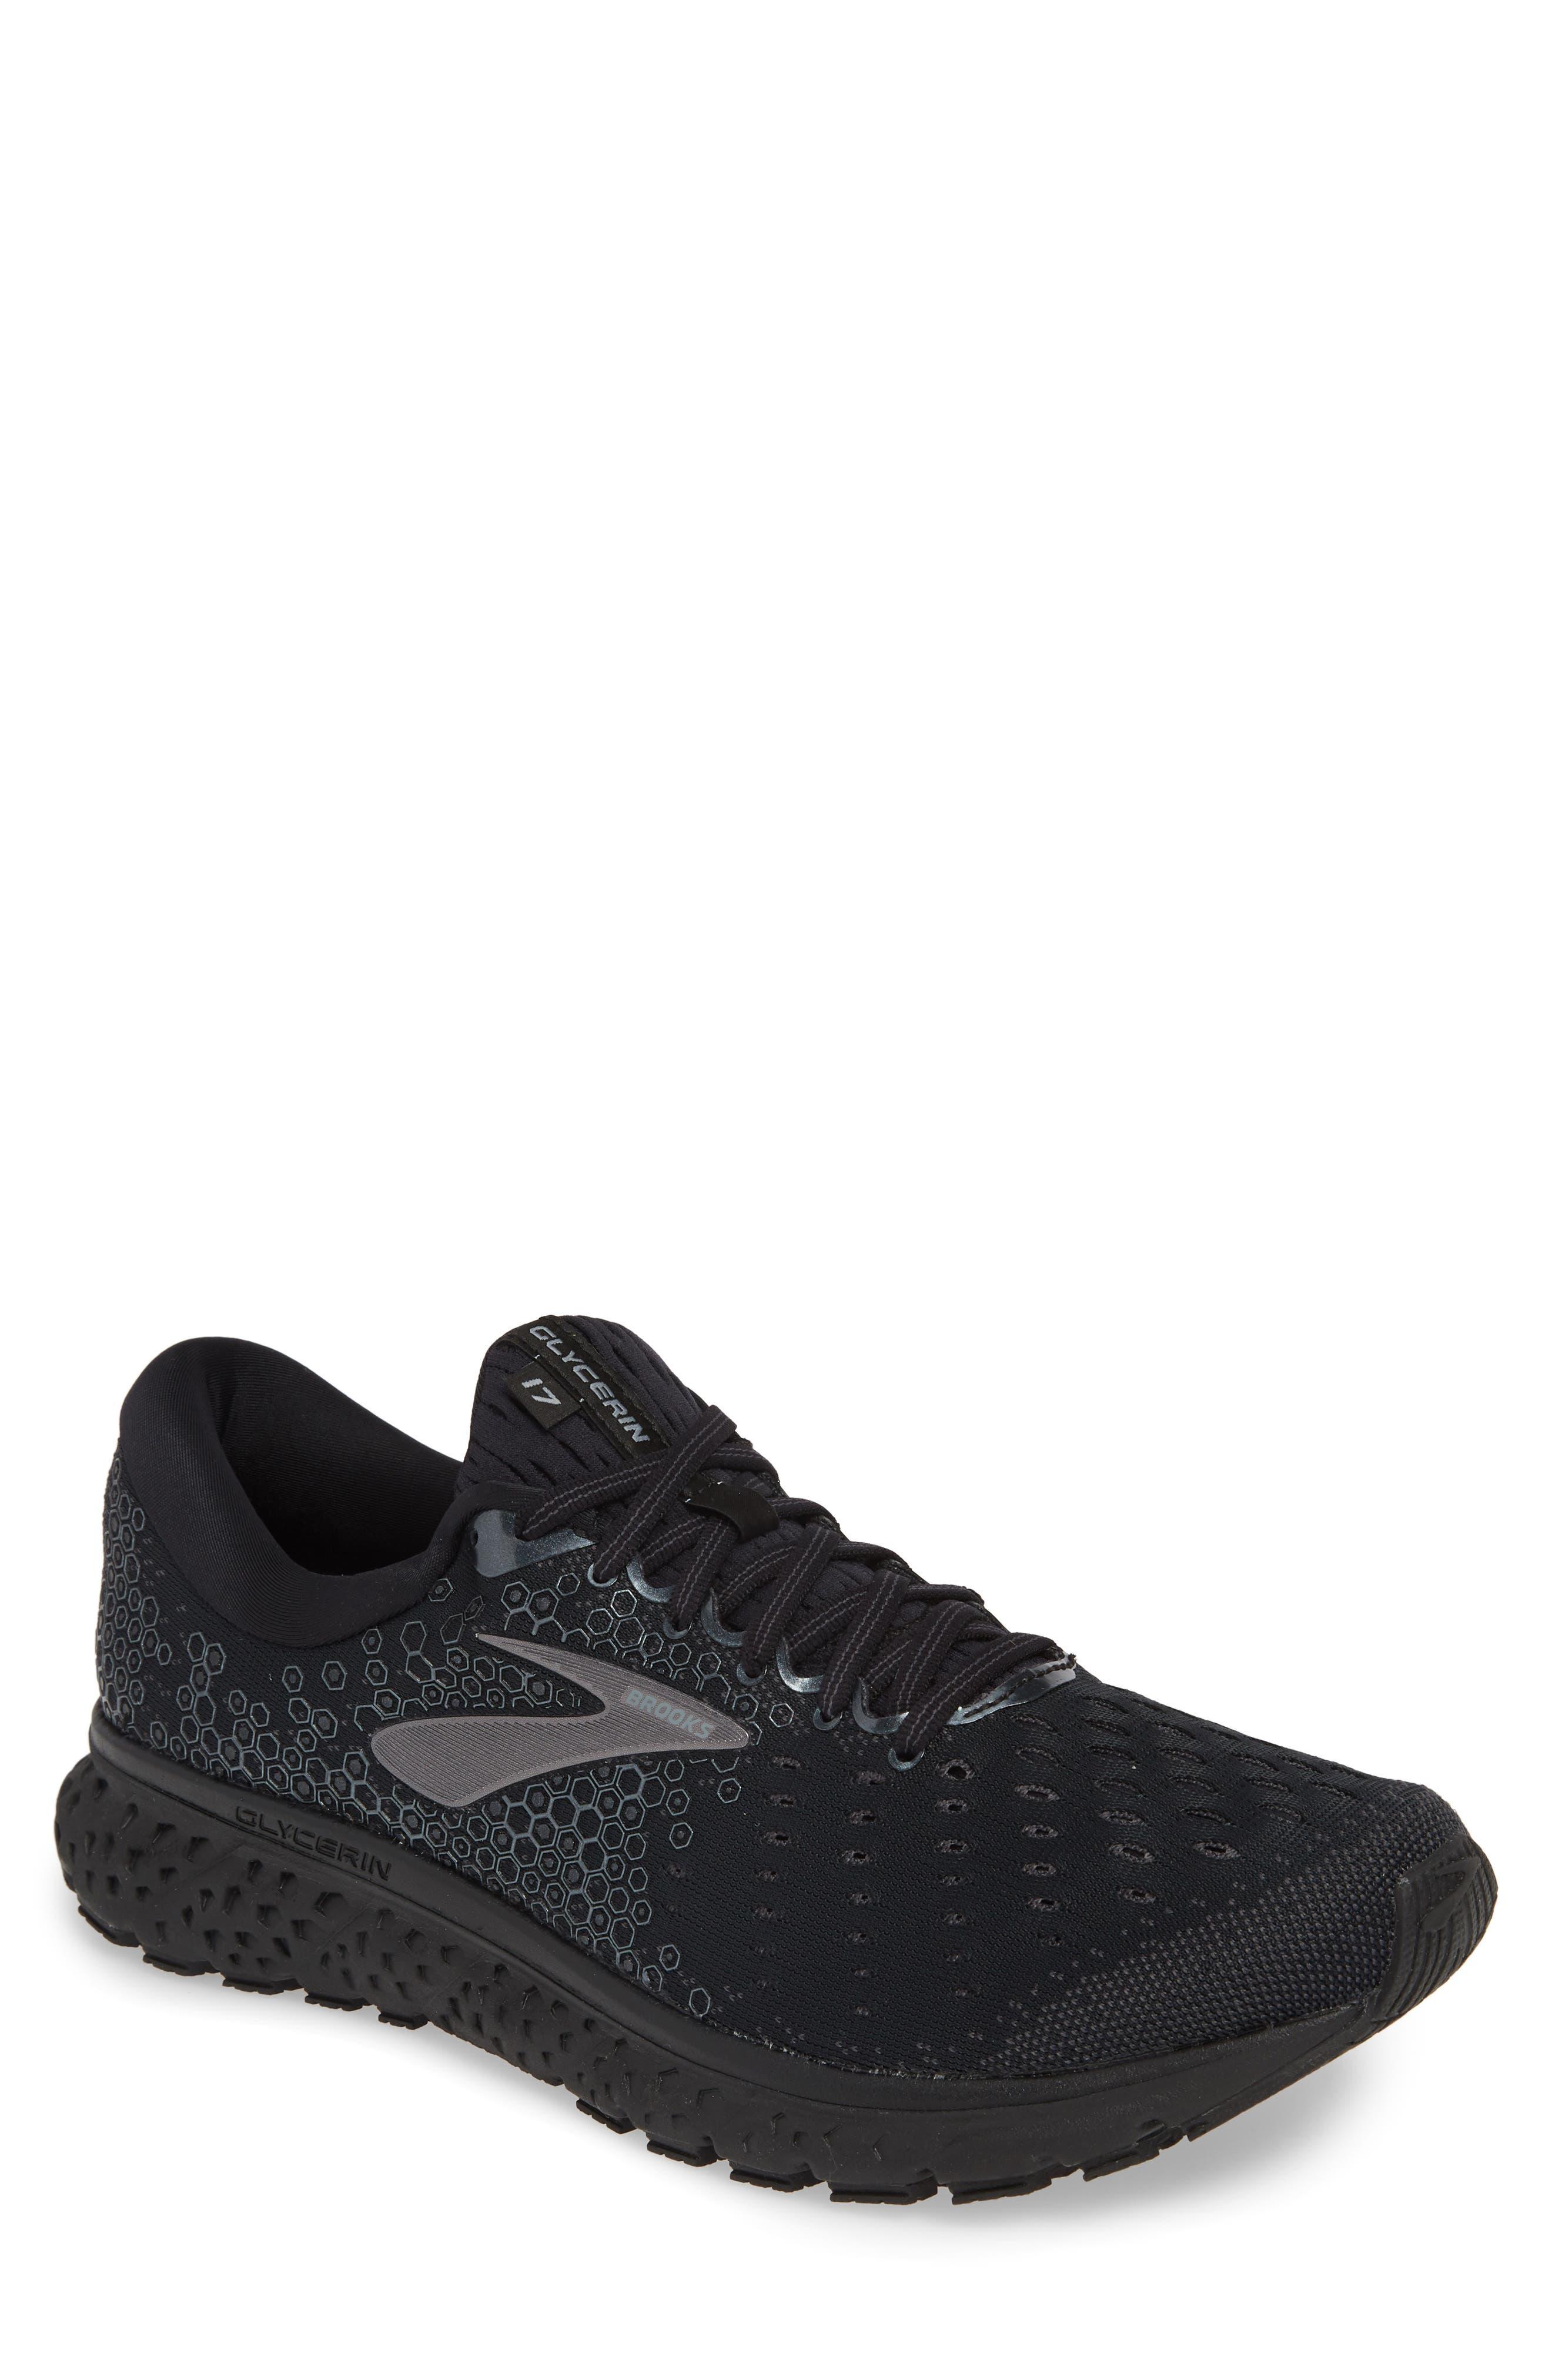 Brooks Glycerin 17 Running Shoe - Black